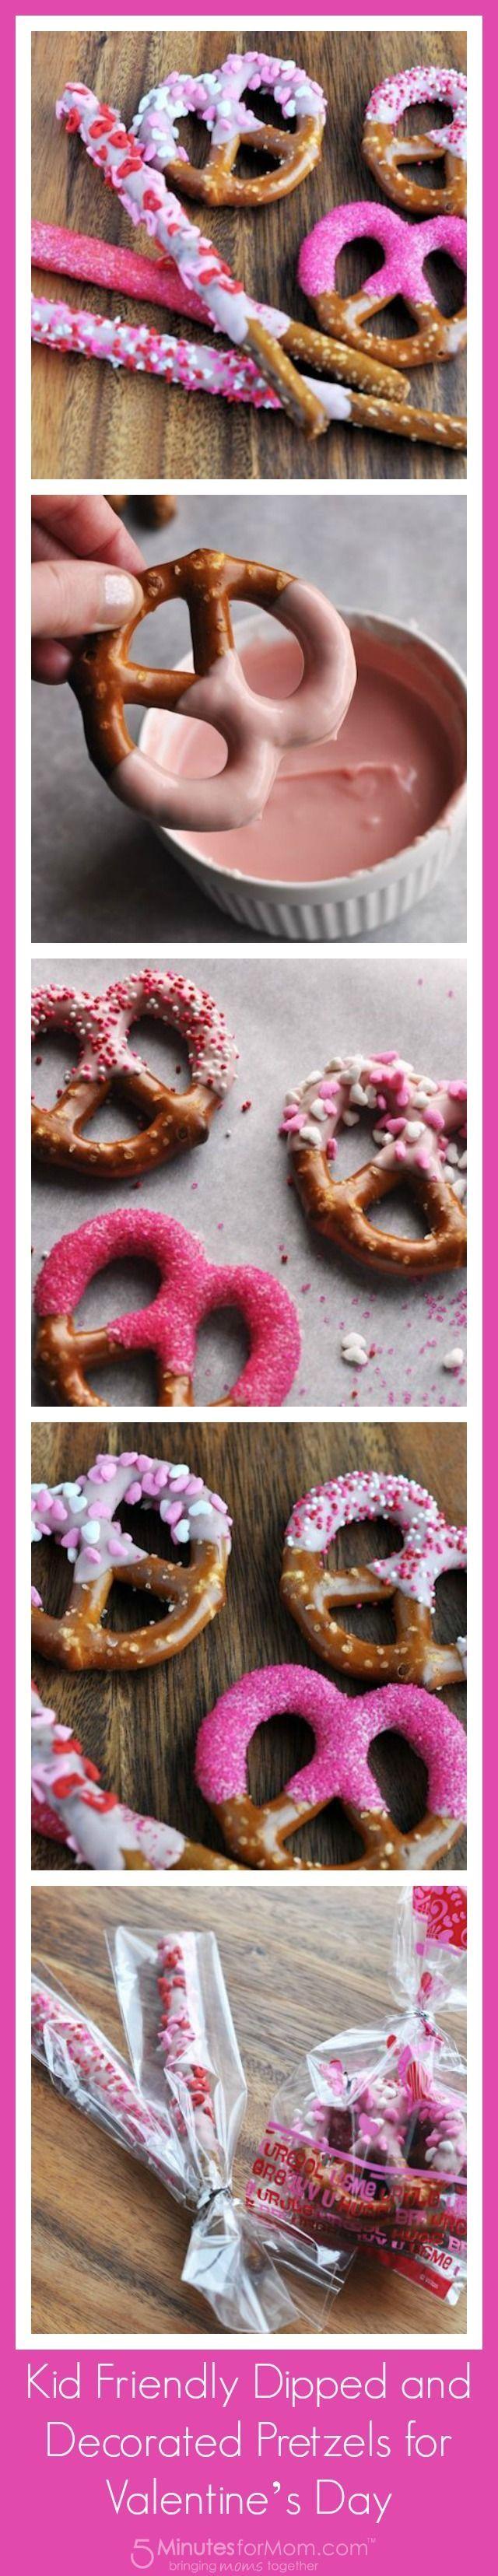 Cute and easy treats